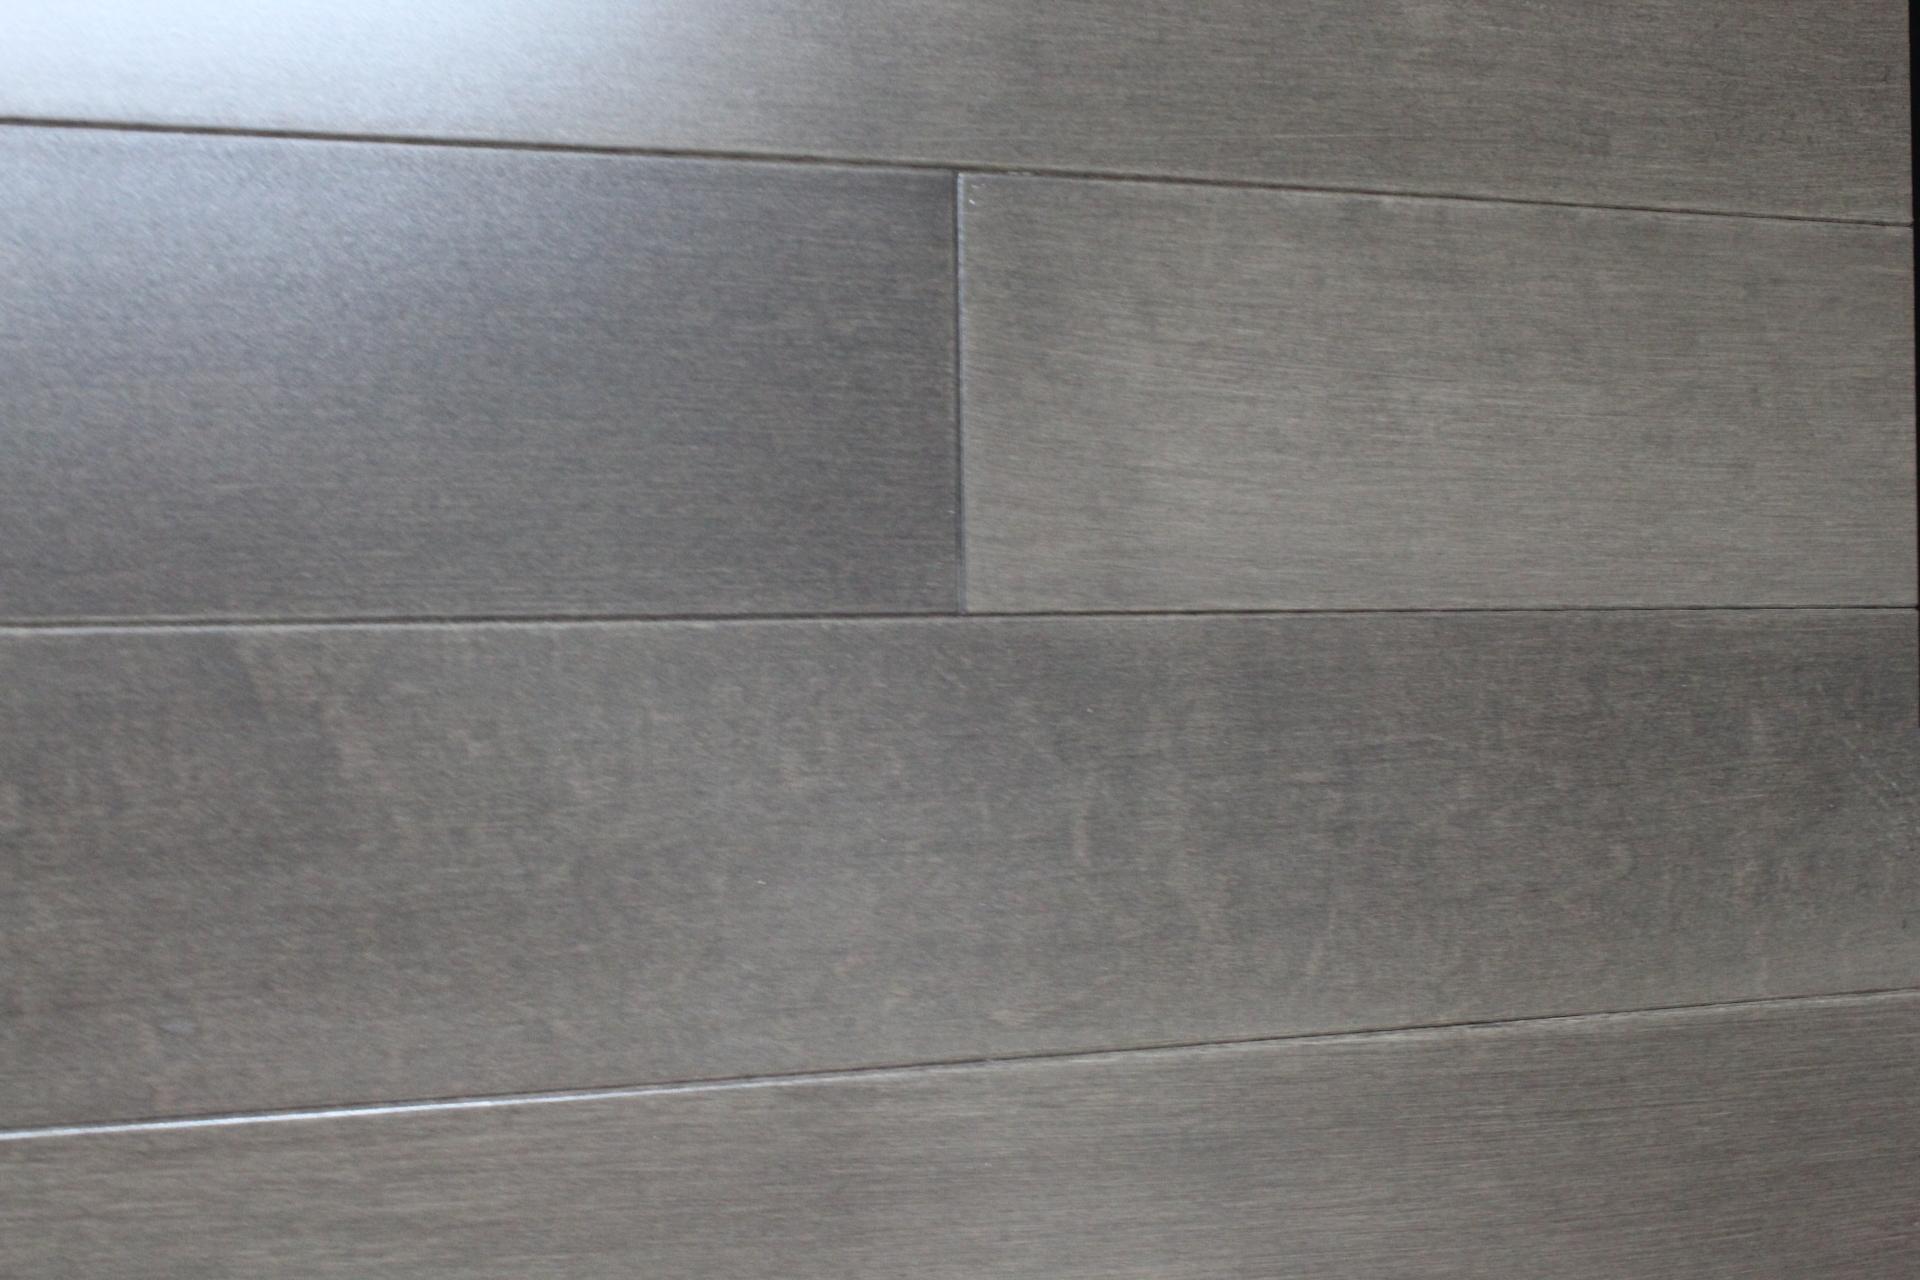 Hardwood, prefinished floor, engineered wood, solid wood, lifestyle, hard surface, prefinished hardwood, prefinished wood, home, design, interior design, wood floor design, LM flooring